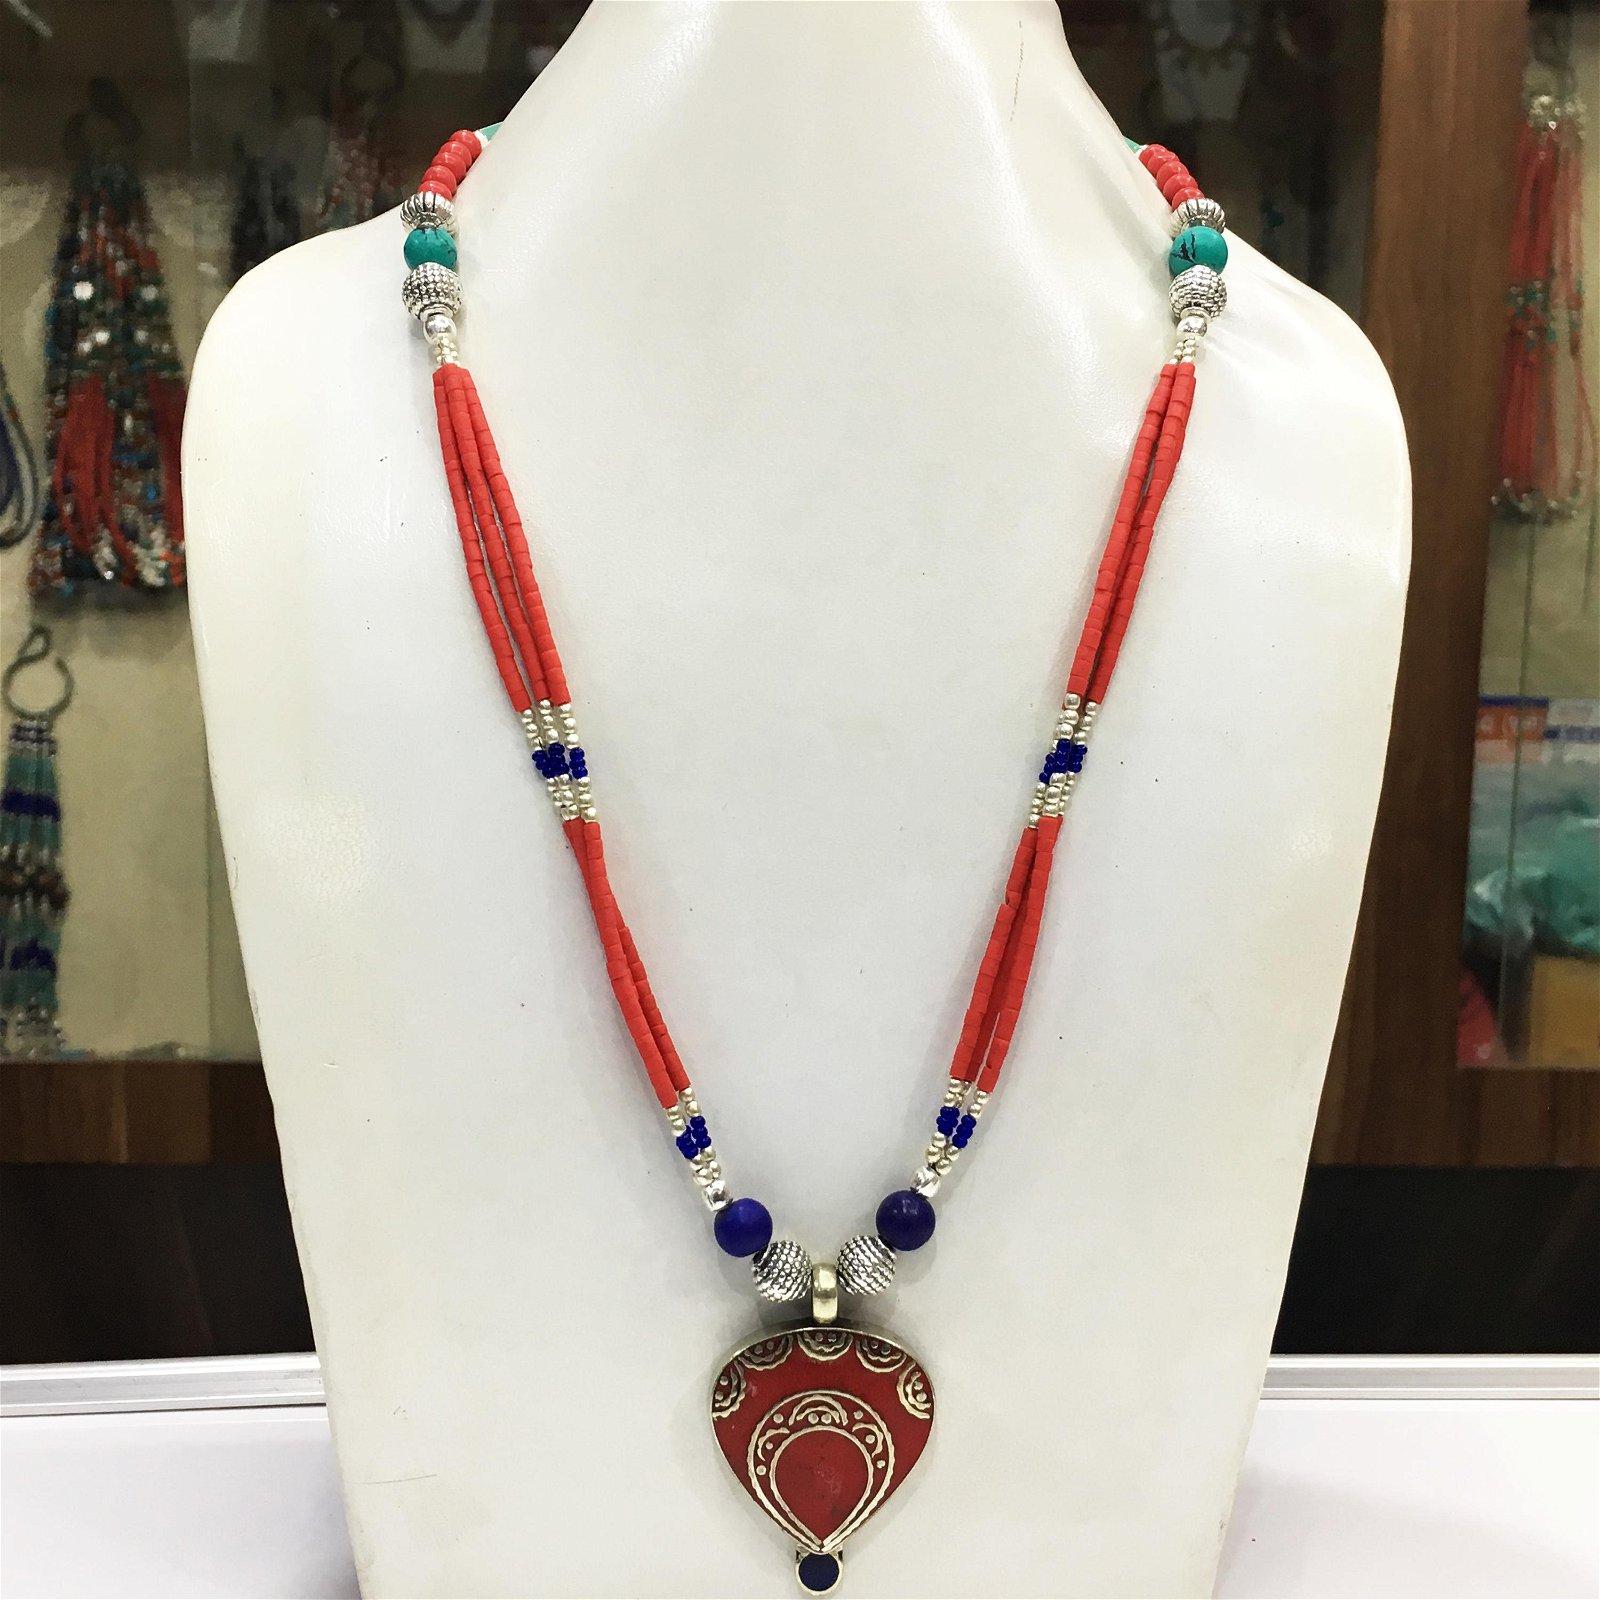 Tibetan Natural Coral Handmade Pendant Necklace